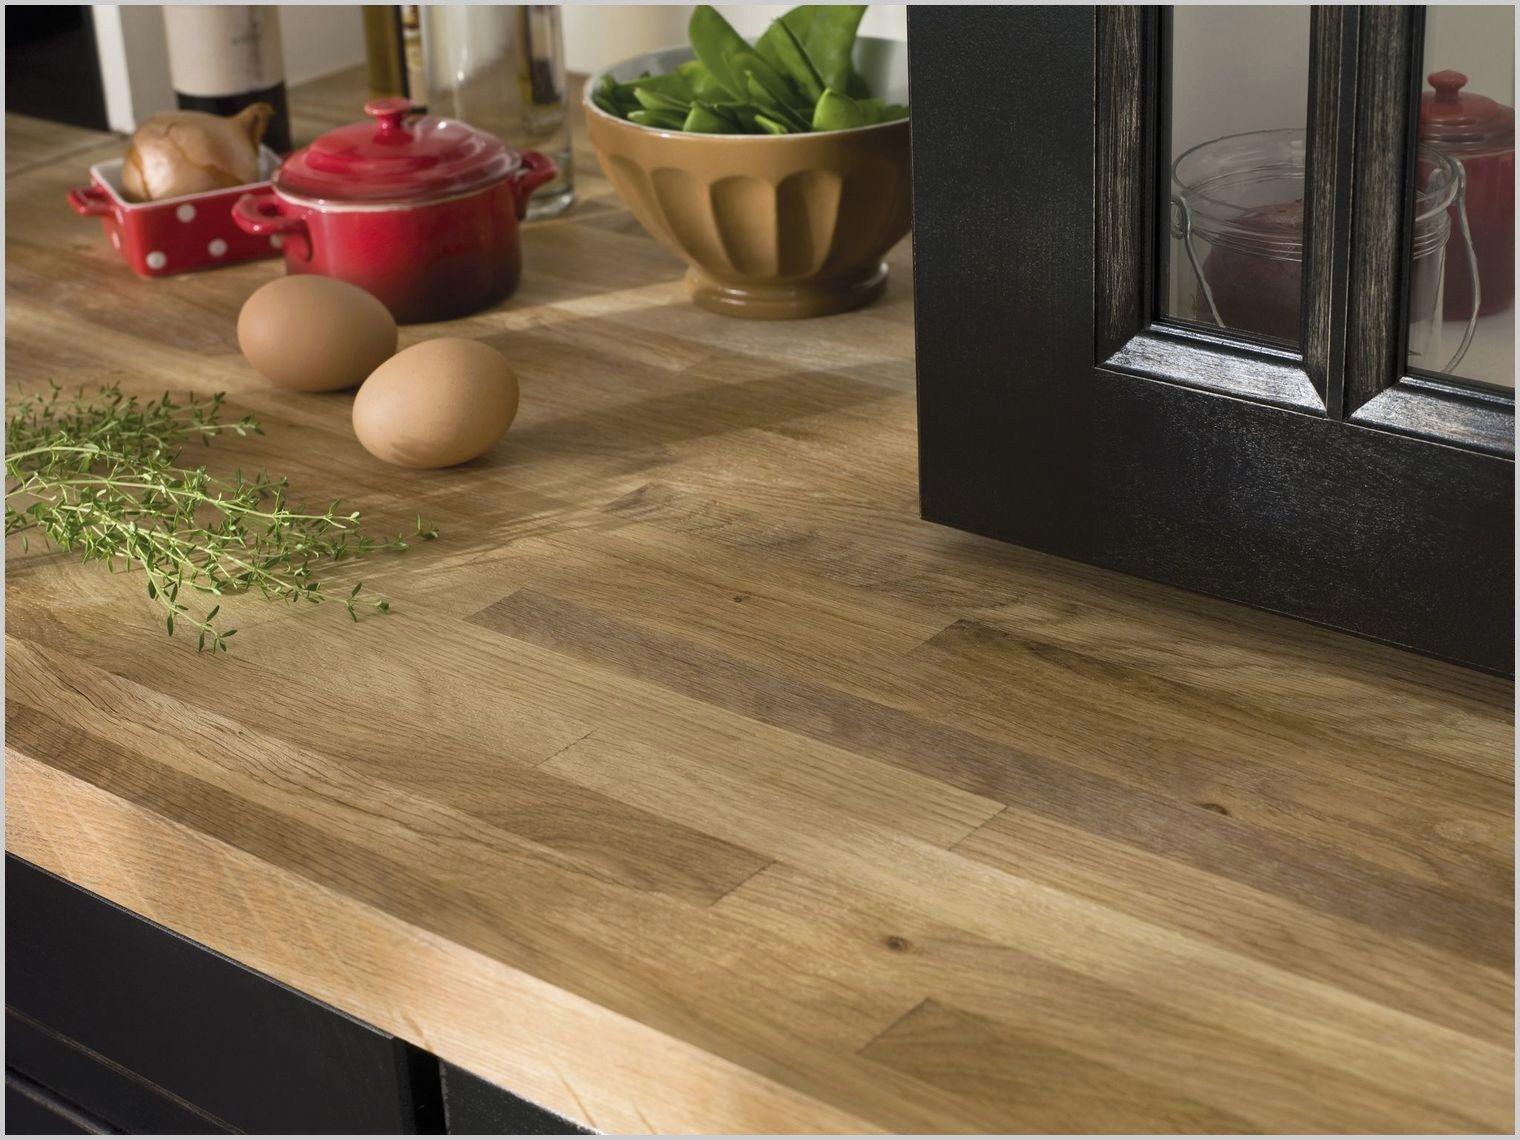 Meilleur Panneau Stratifie Leroy Merlin In 2020 Types Of Kitchen Countertops Kitchen Worktop Kitchen Countertops